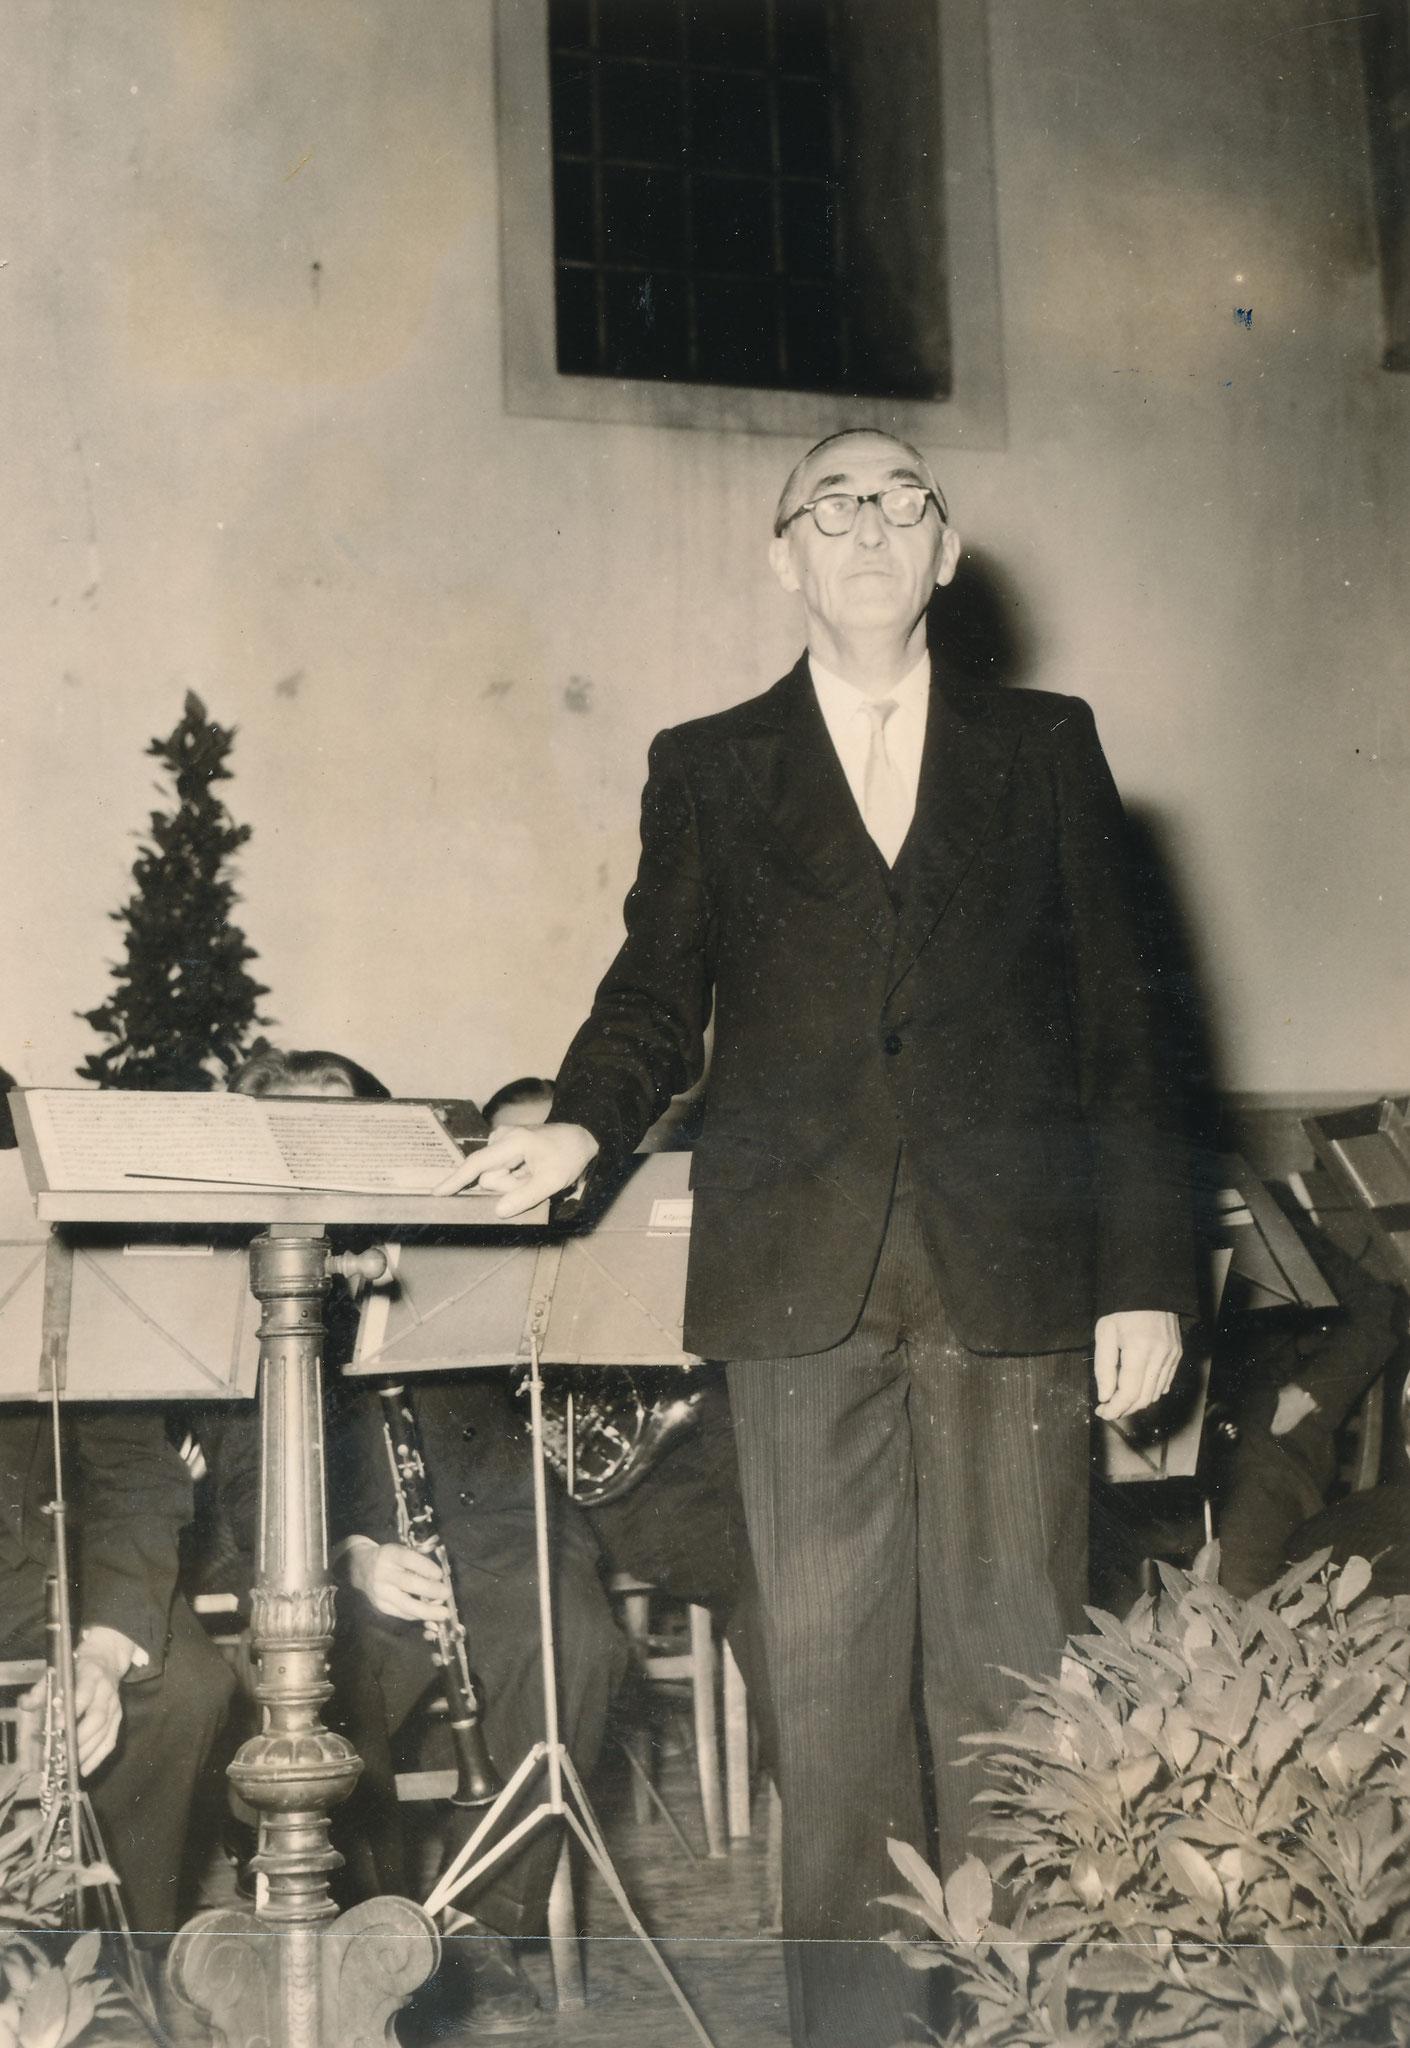 Dirigent Josef Keip